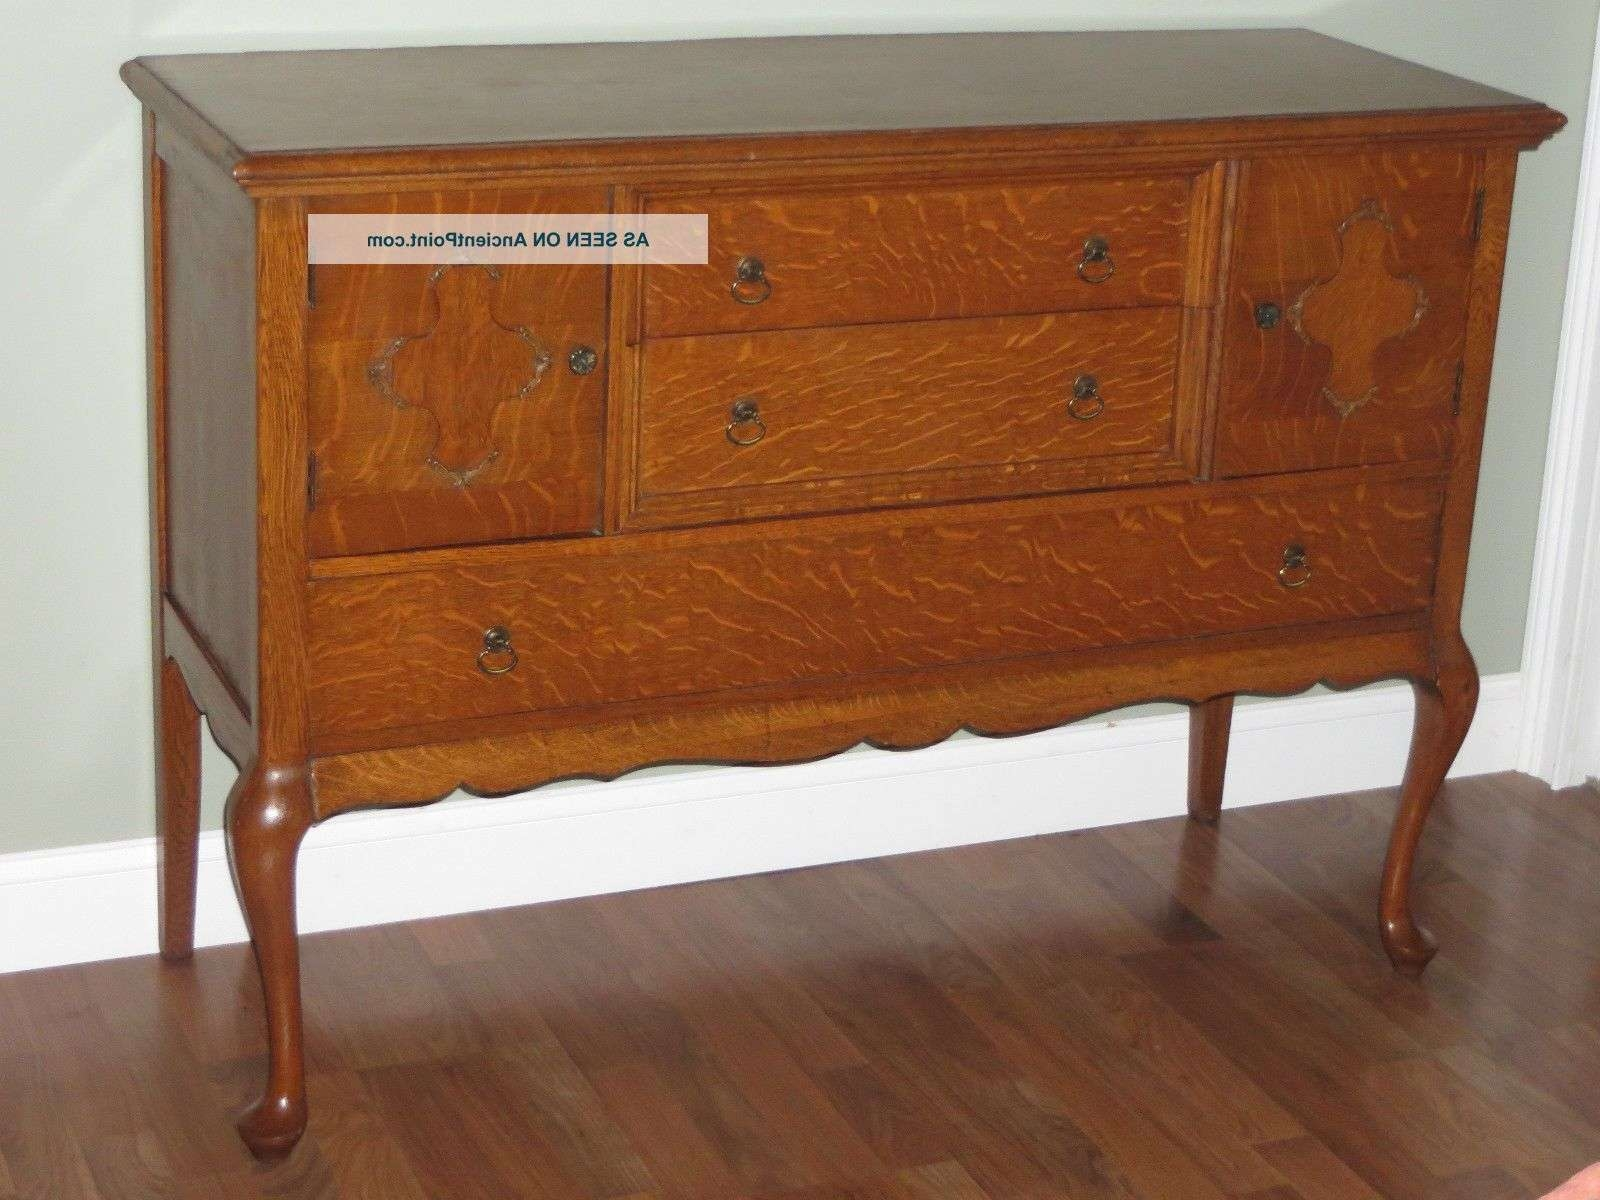 Antique Buffet Value Antique Tiger Oak Sideboard Buffet Server For Antique Sideboards And Buffets (View 5 of 20)